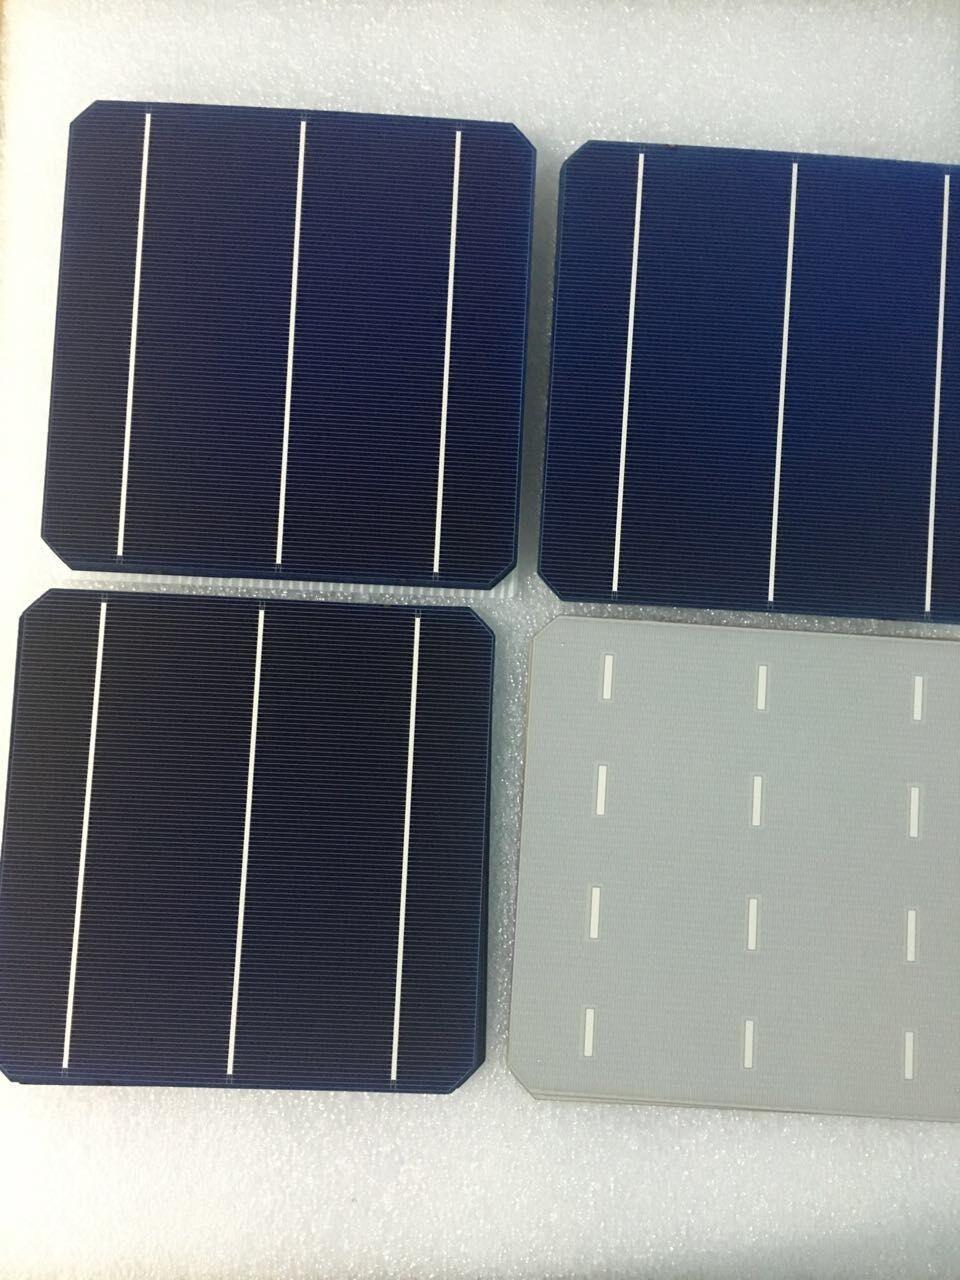 c94e2514e0c6 Click here!! ¡ Promoción! 50 unids 20.4% 5 W 156mm 3BB molicristalino  célula solar para el panel solar DIY